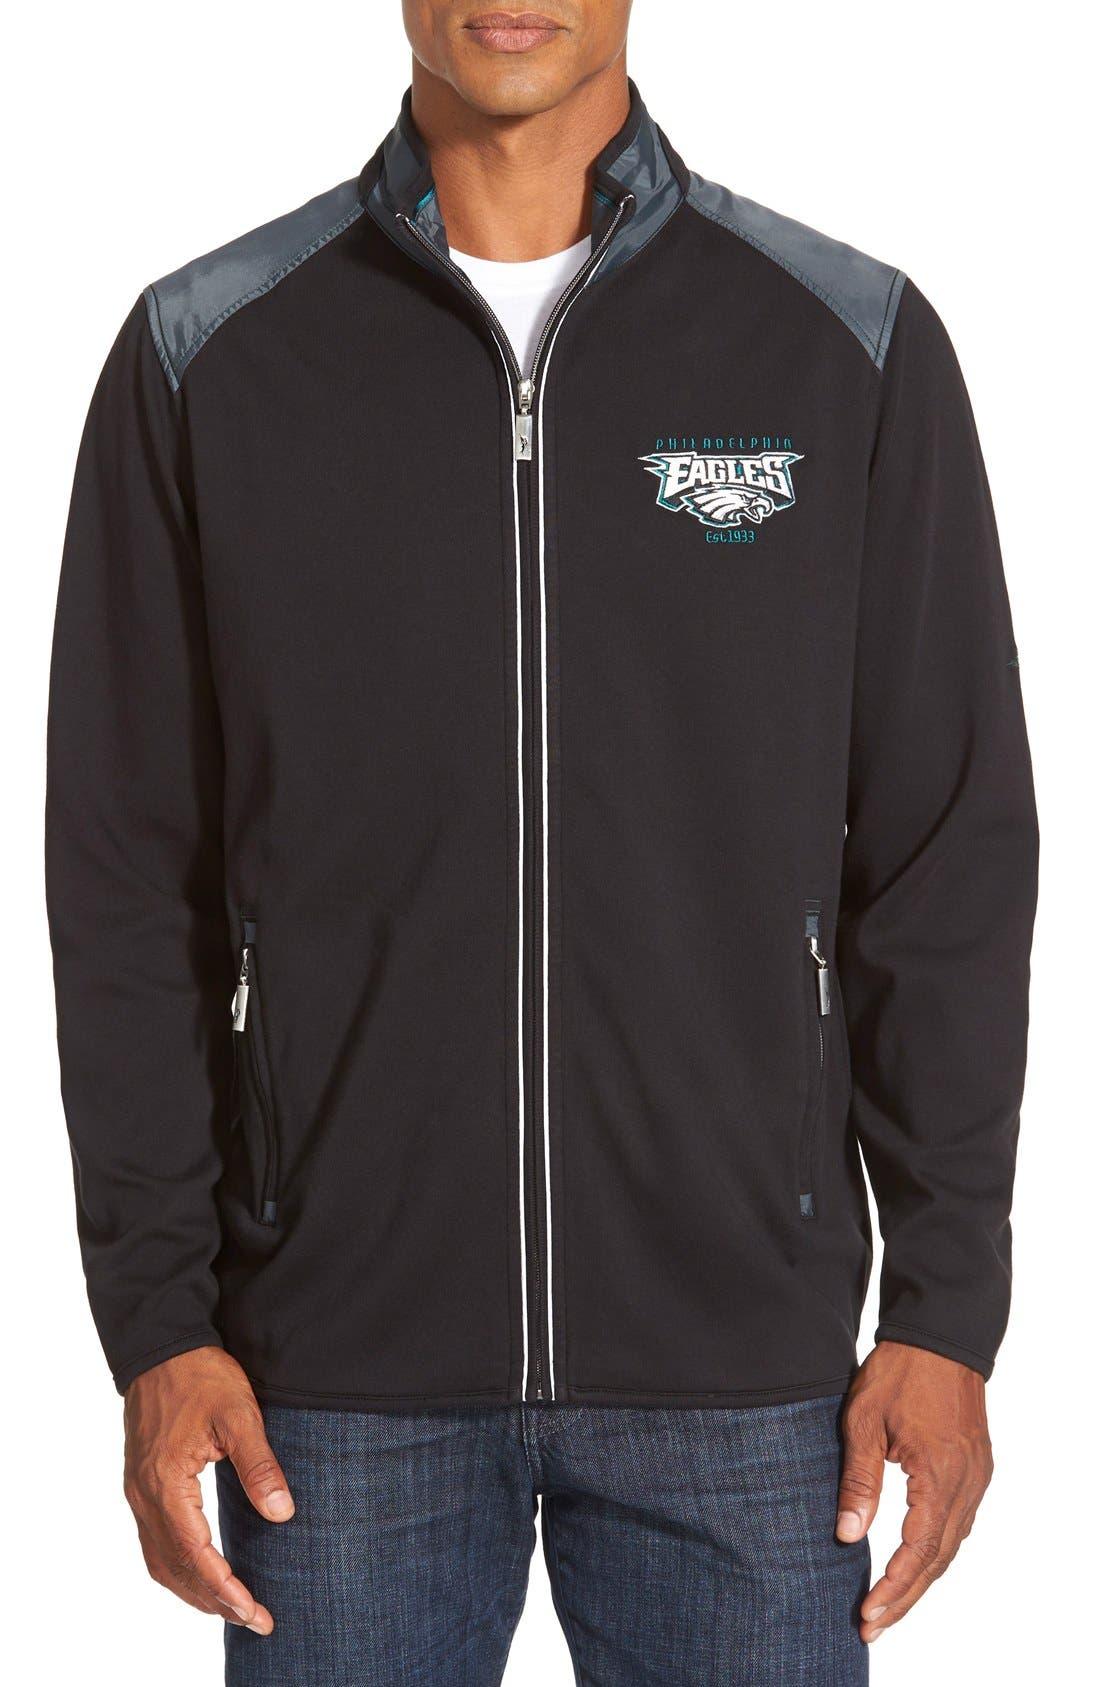 TOMMY BAHAMA 'Goal Line - Baltimore Ravens' NFL Full Zip Jacket, Main, color, 001